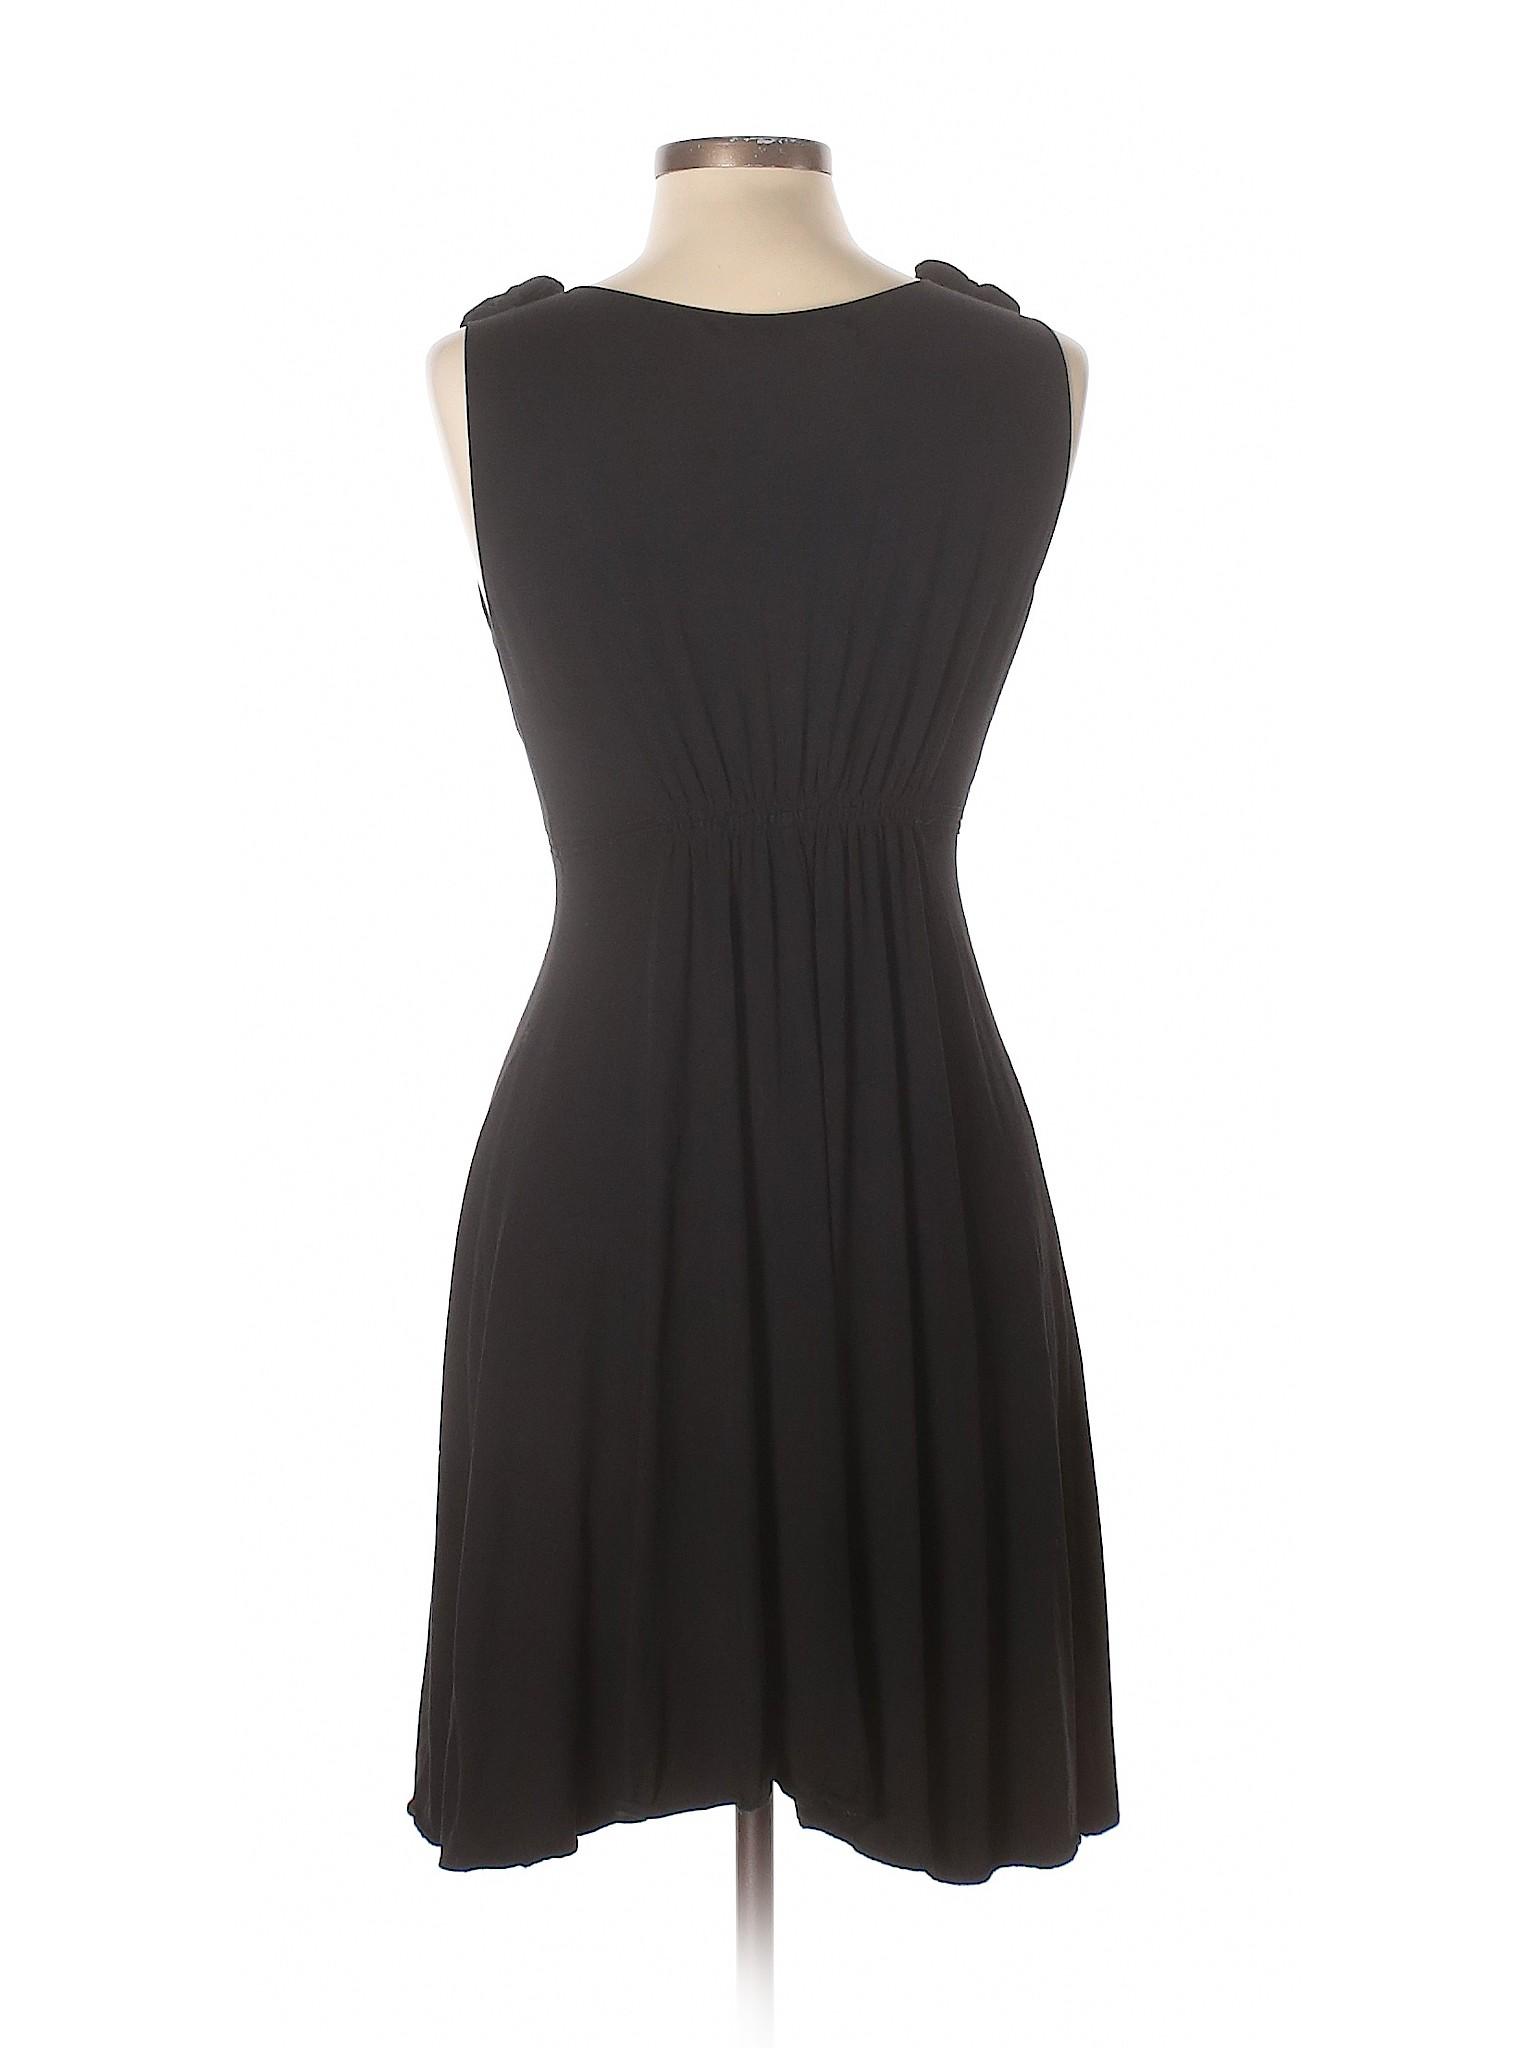 Casual winter Dress Boutique Studio Max q0xPPt